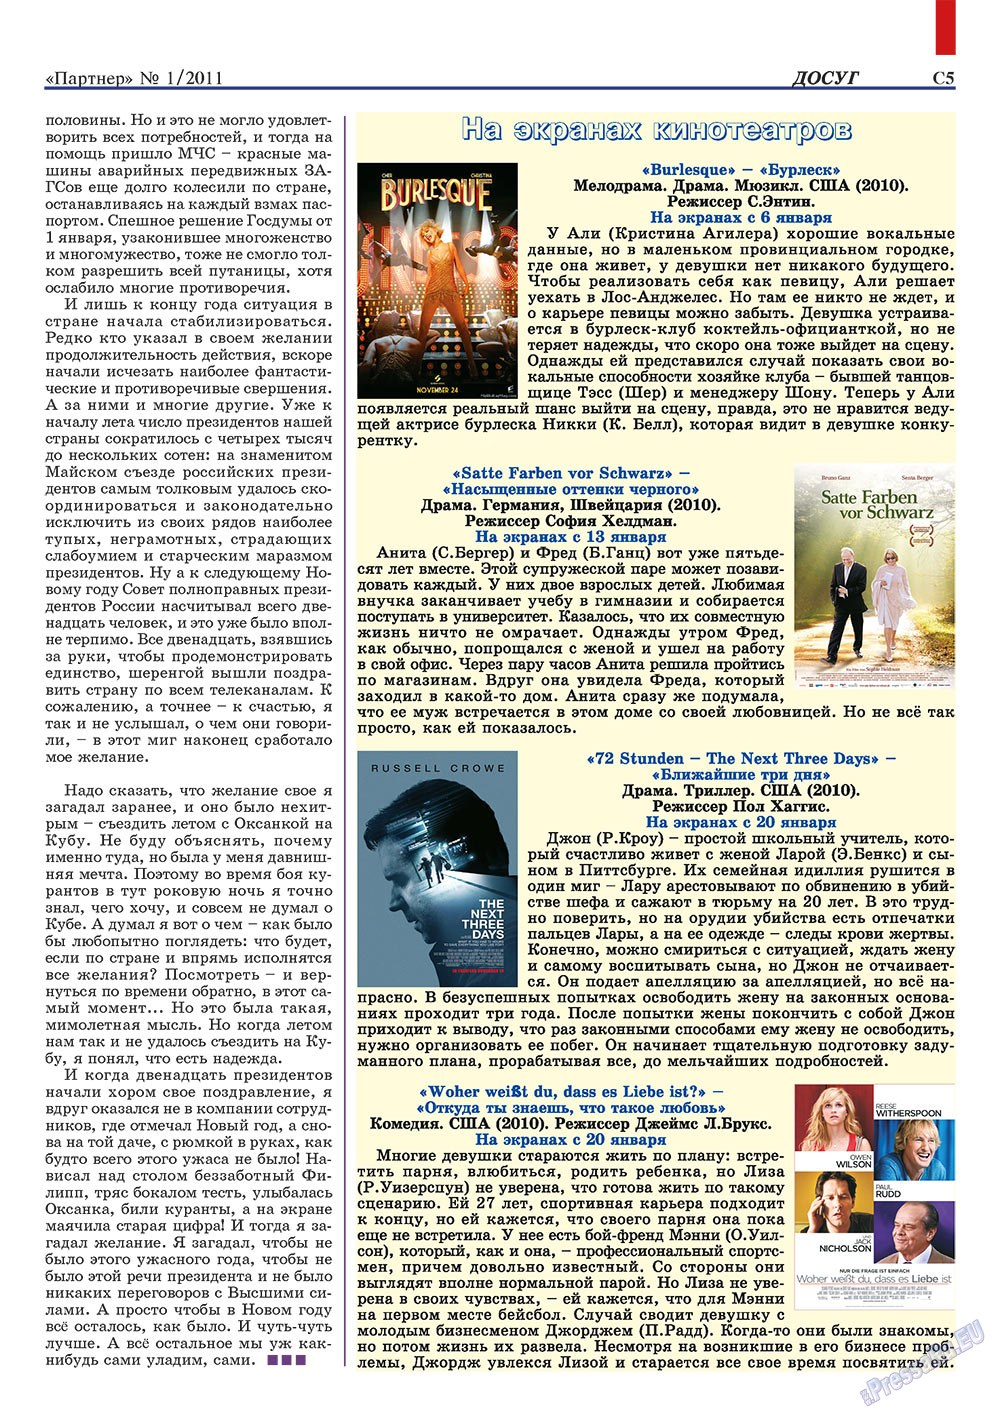 Партнер-север (журнал). 2011 год, номер 1, стр. 63